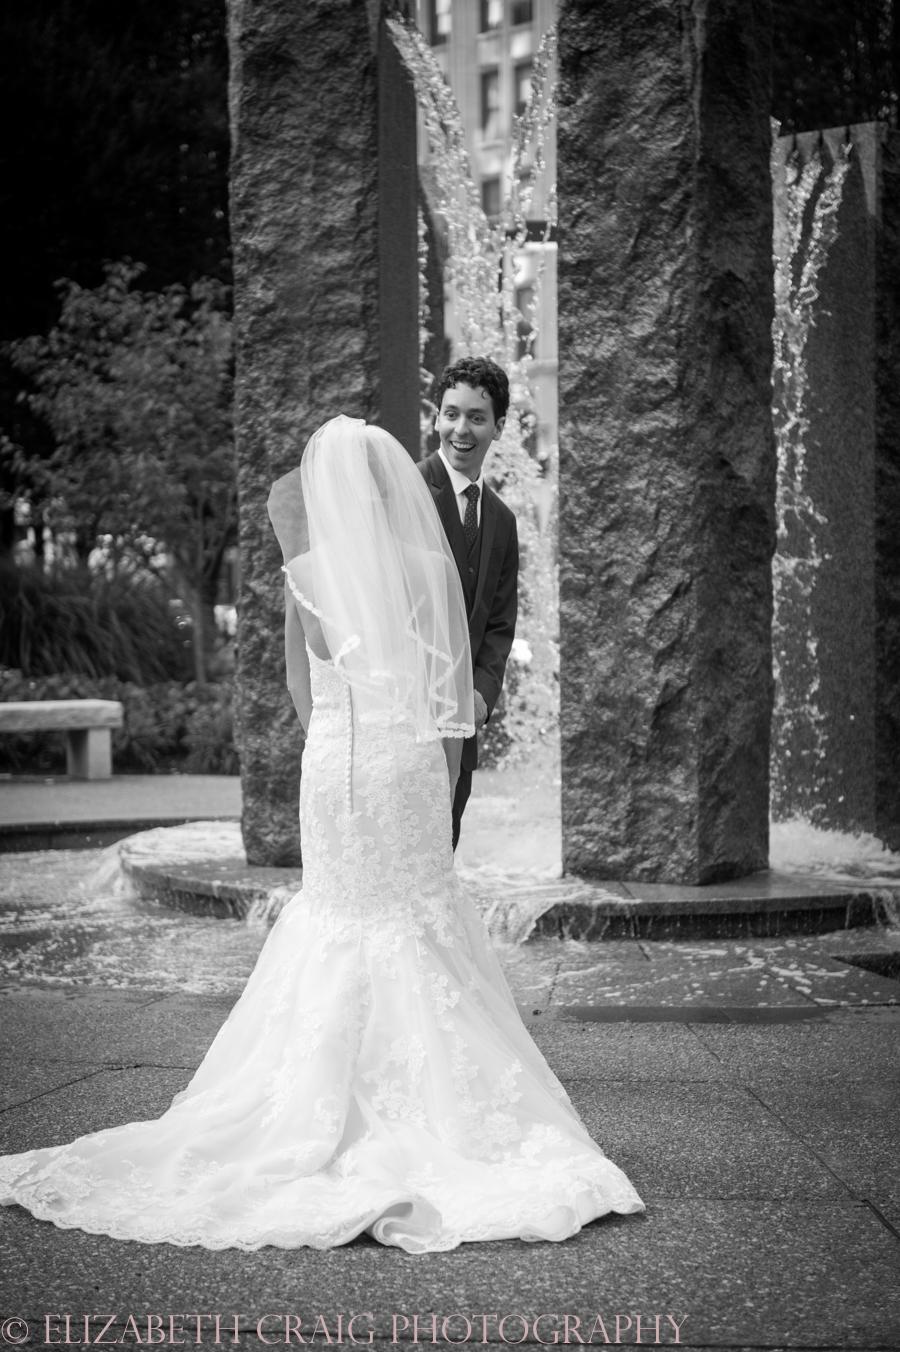 pittsburgh-wedding-photographers-doubletree-pittsburgh-sacred-heart-elizabeth-craig-photography-11